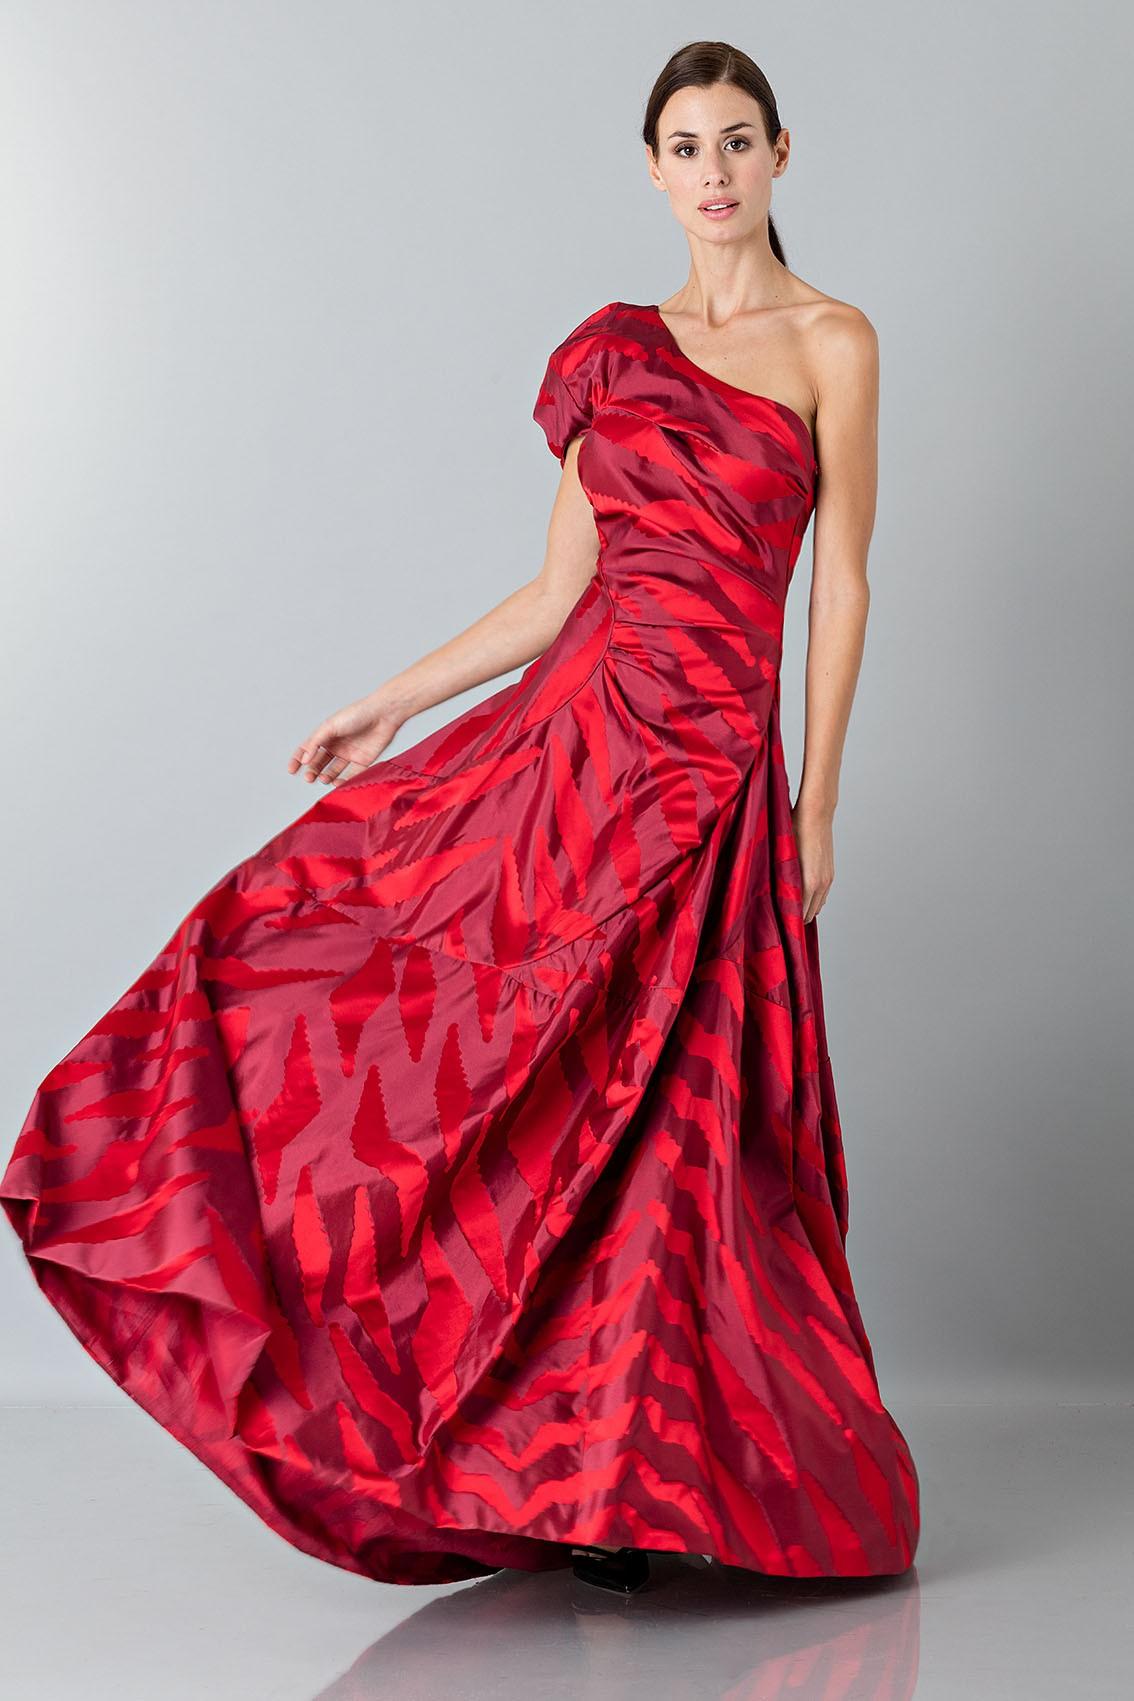 Buy A Vivienne Westwood Dress